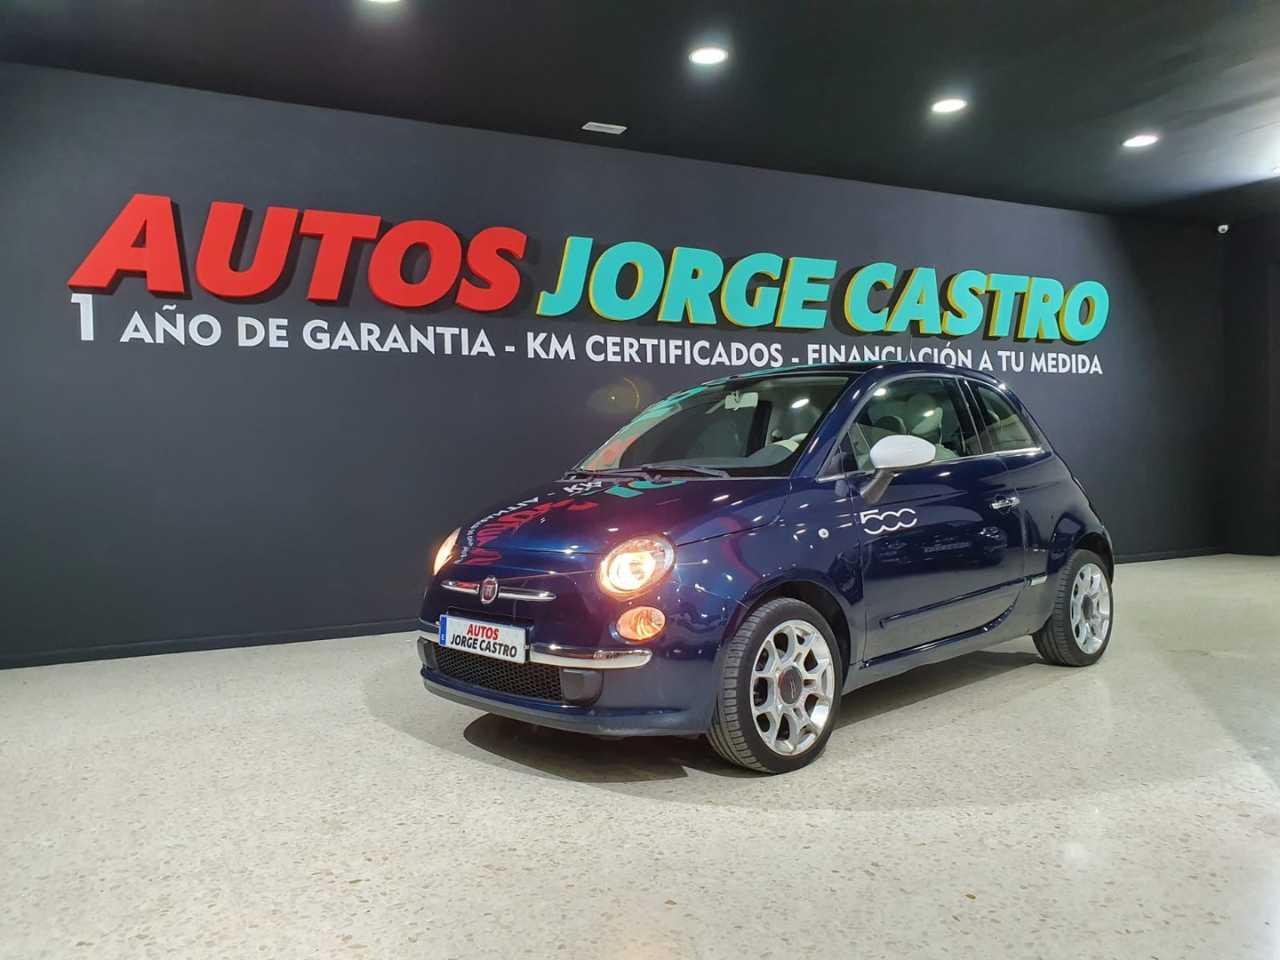 Fiat 500 1.2 8v 69 Cv Lounge   - Foto 1